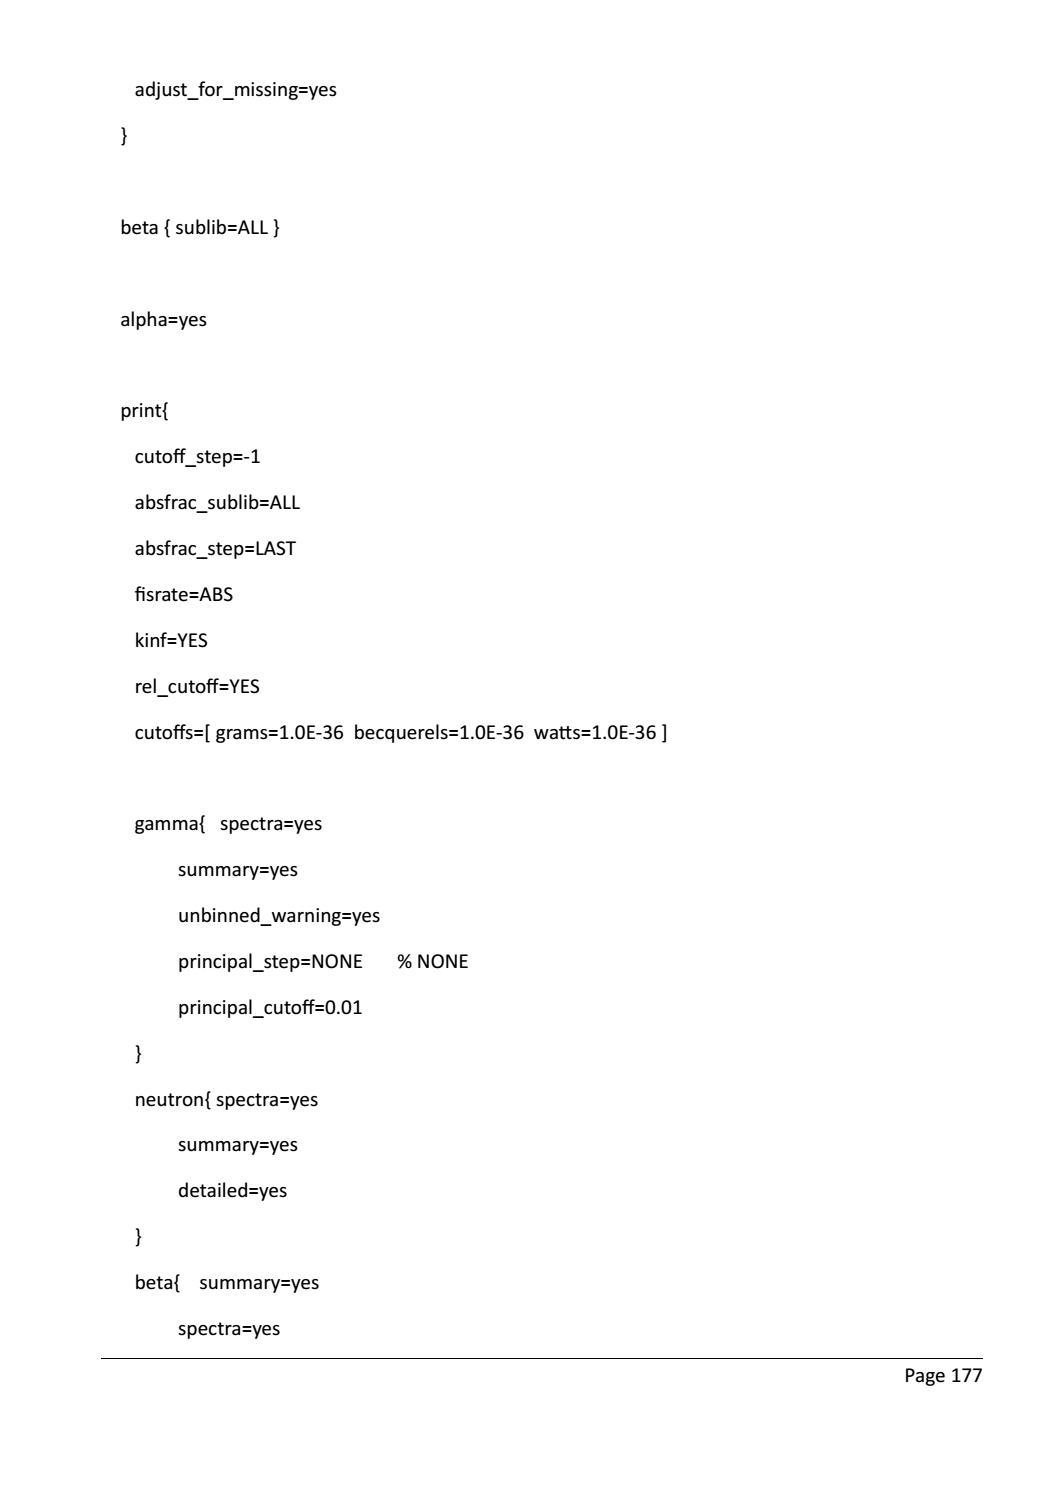 RADIOACTIVE WASTE: COMPUTATIONAL CHARACTERISATION and SHIELDING page 202